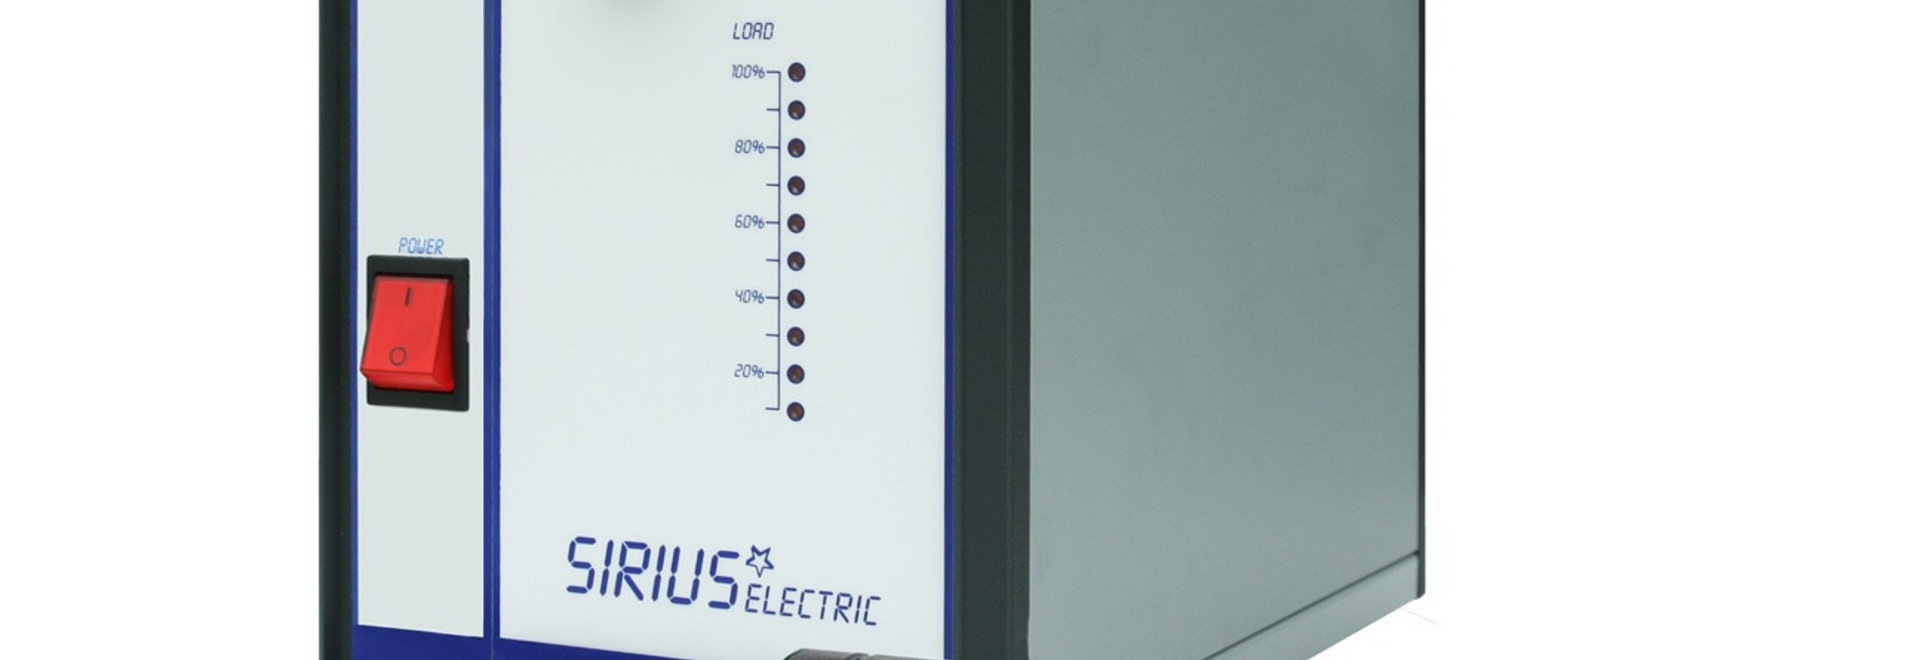 Ultrasonic Generators Digital Se 09 Series Via Lucio Mastronardi Products Generator Circuit